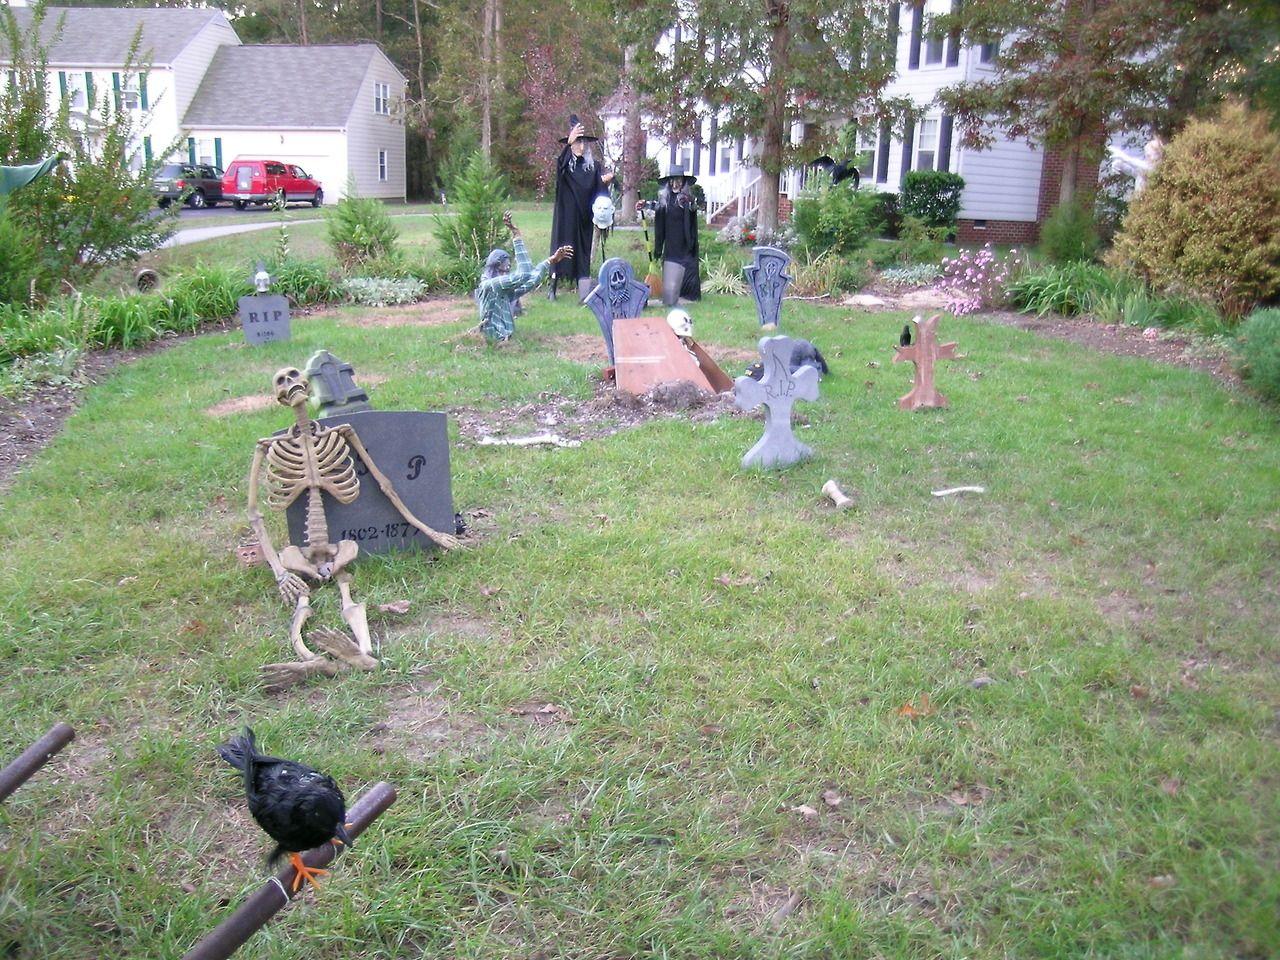 graveyard witch skeleton halloween decorations halloween pictures happy halloween halloween images halloween decorations graveyard halloween ideas